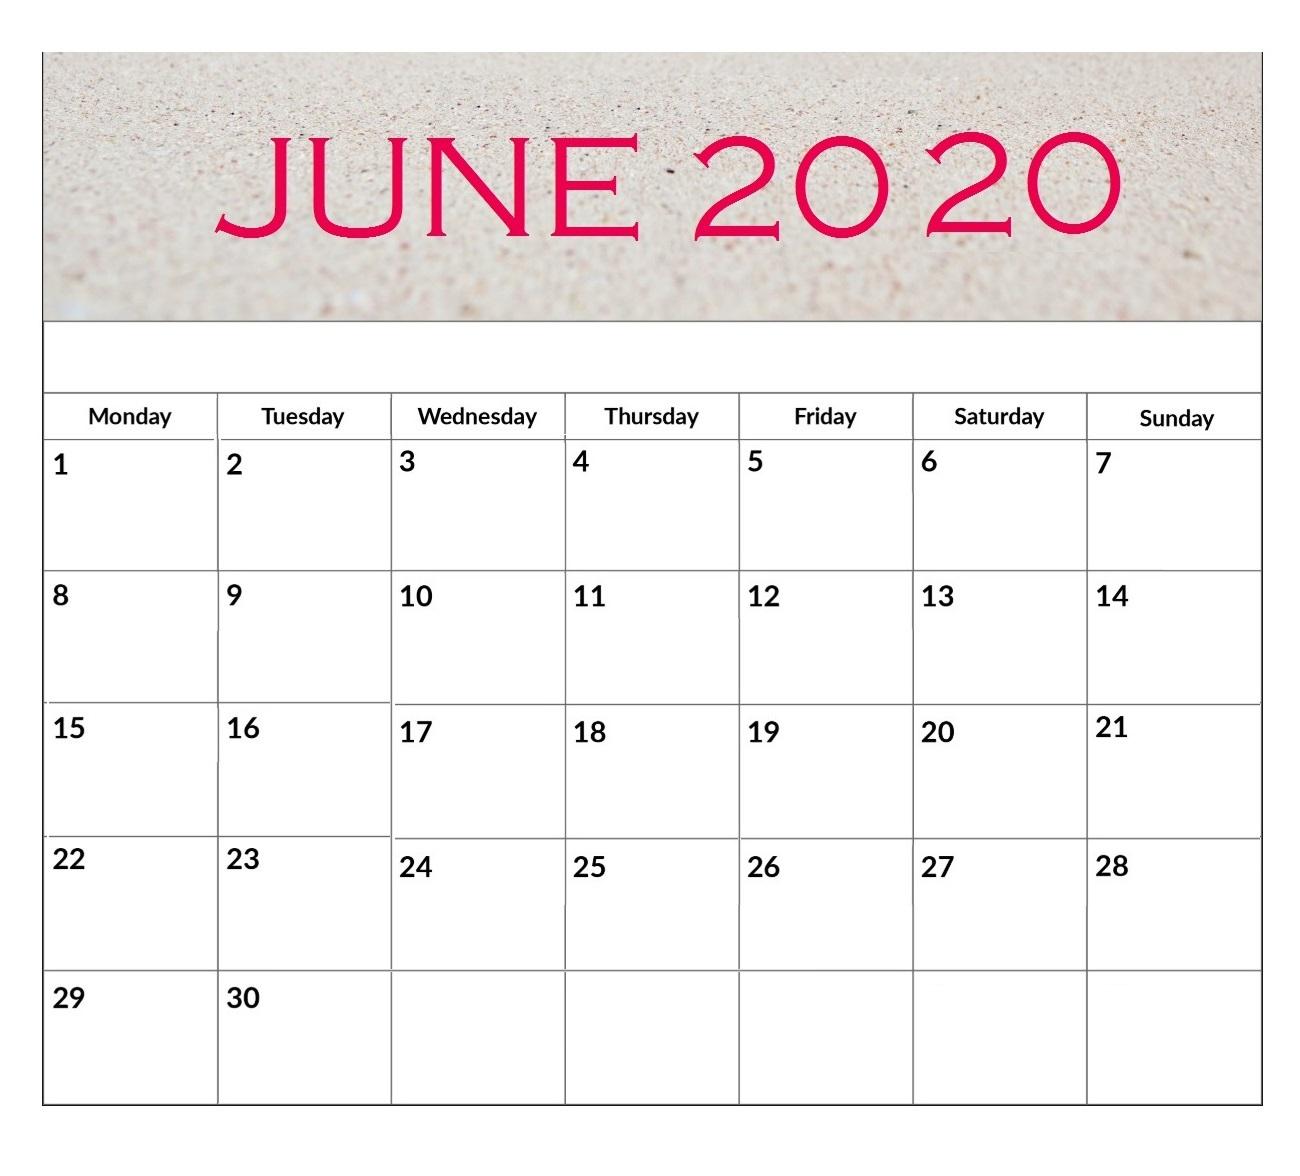 June 2020 Printable Desk Calendar